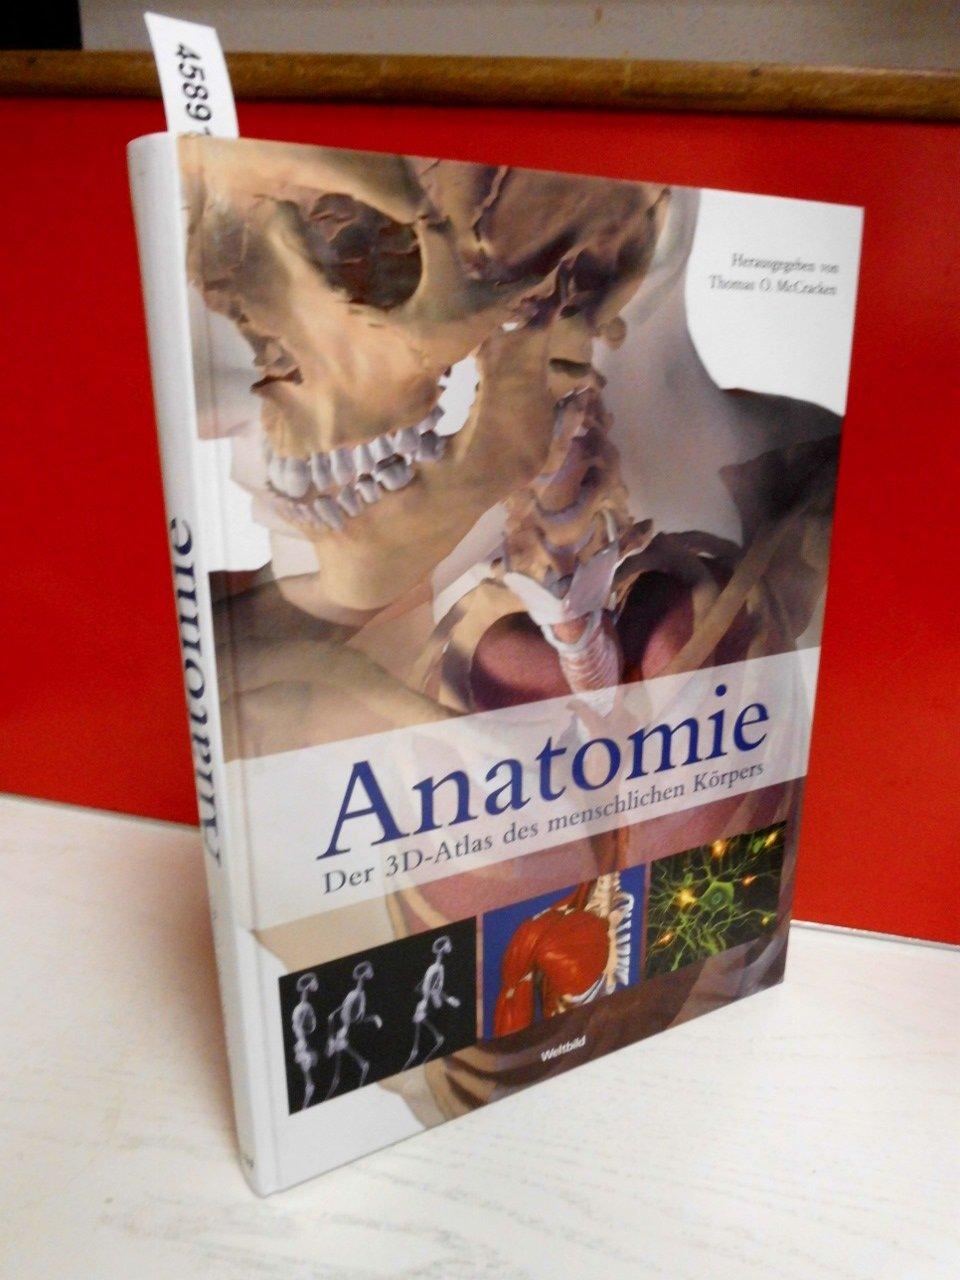 Anatomie - Der 3D-Atlas des menschlichen Körpers: Amazon.de: Thomas ...